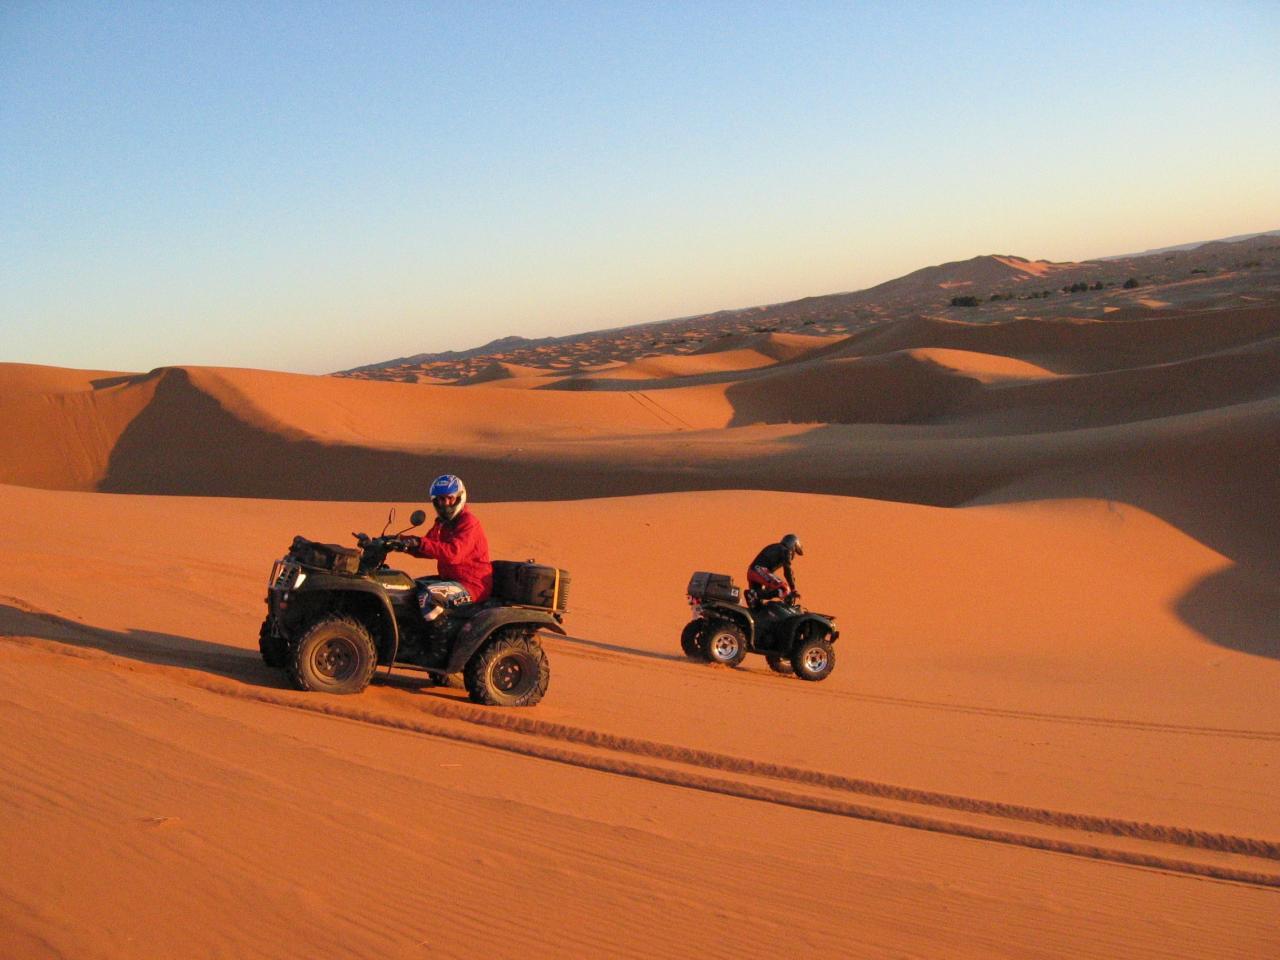 days from marrakech to desert,Desert Morocco, Ouarzazate ait ben haddou,Quad and bike in Erg Chebbi Merzouga